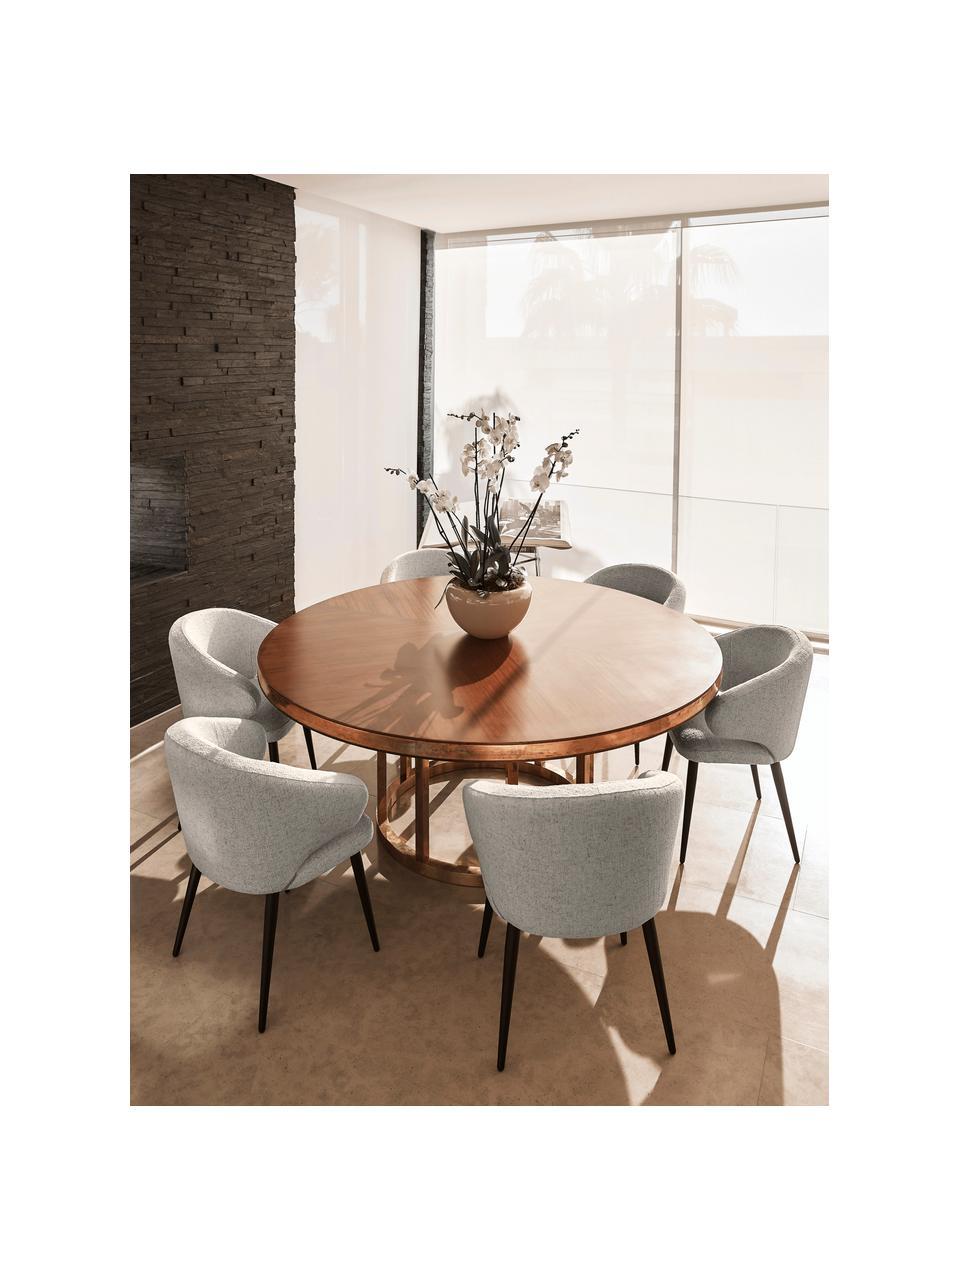 Chaise design moderne Celia, Tissu gris clair